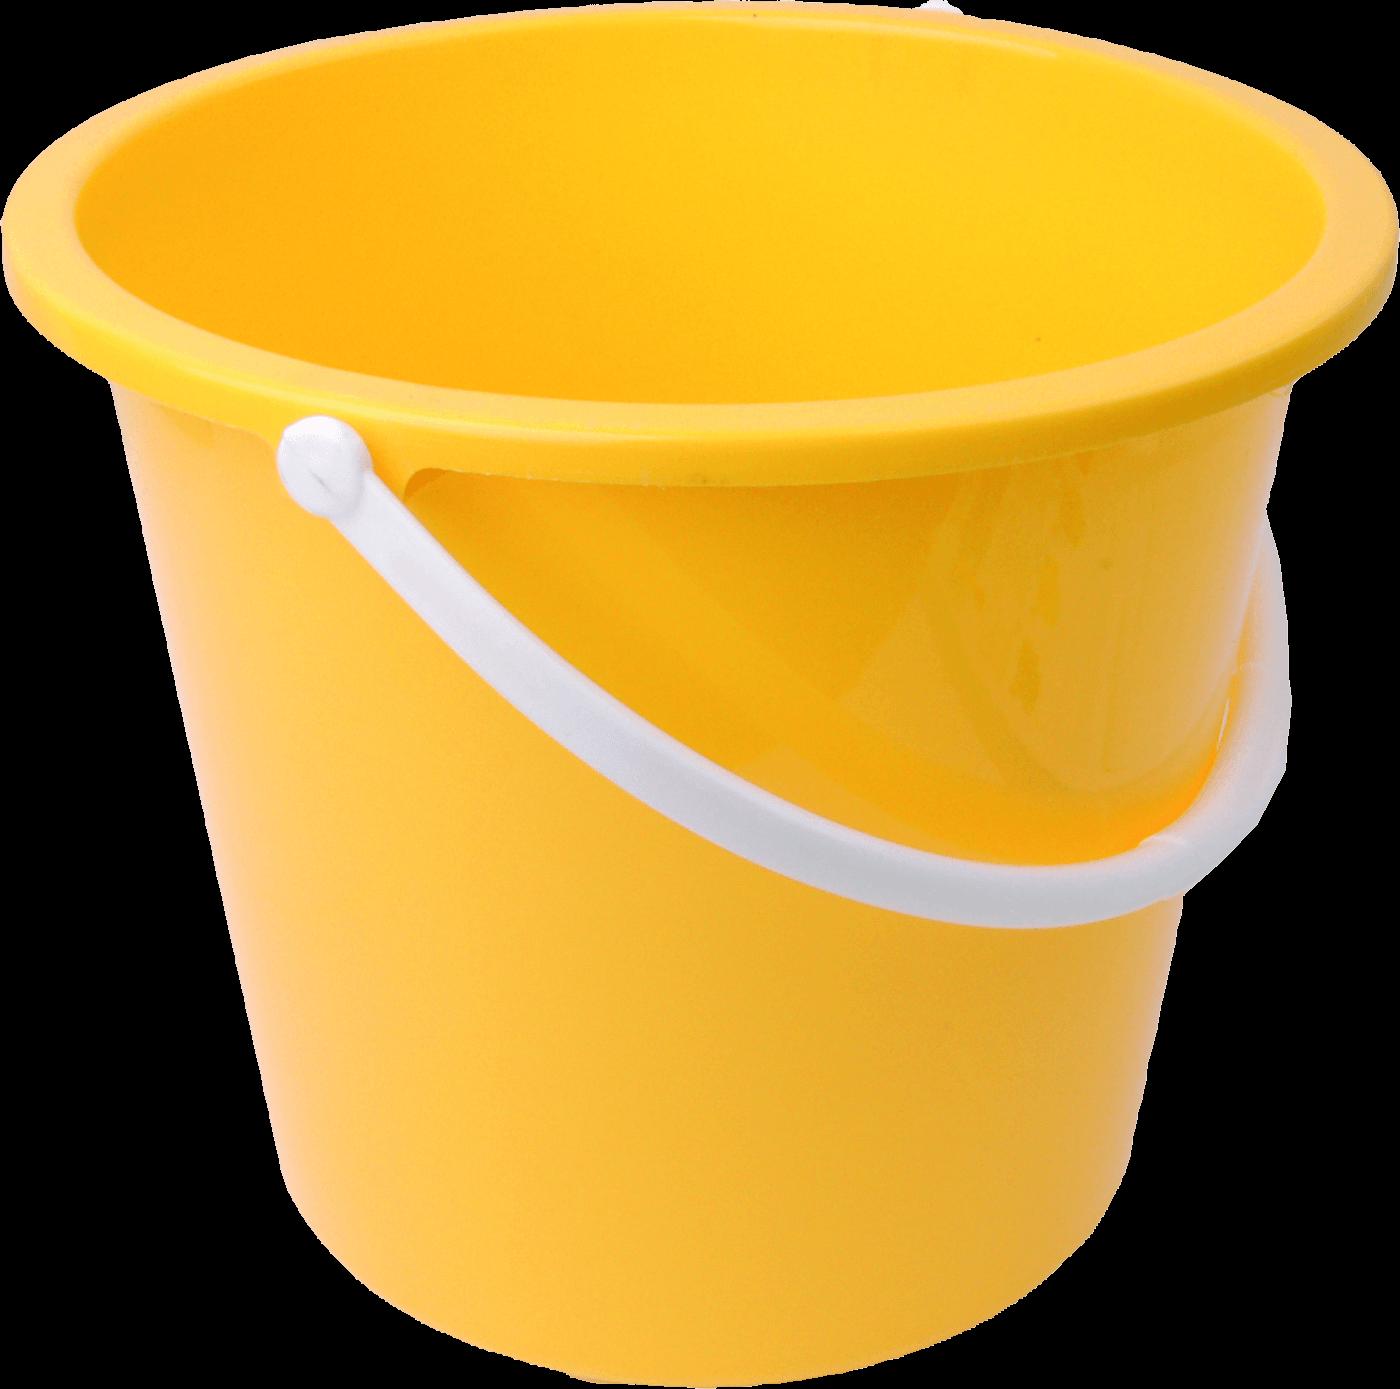 Bucket clipart yellow bucket. Transparent png stickpng